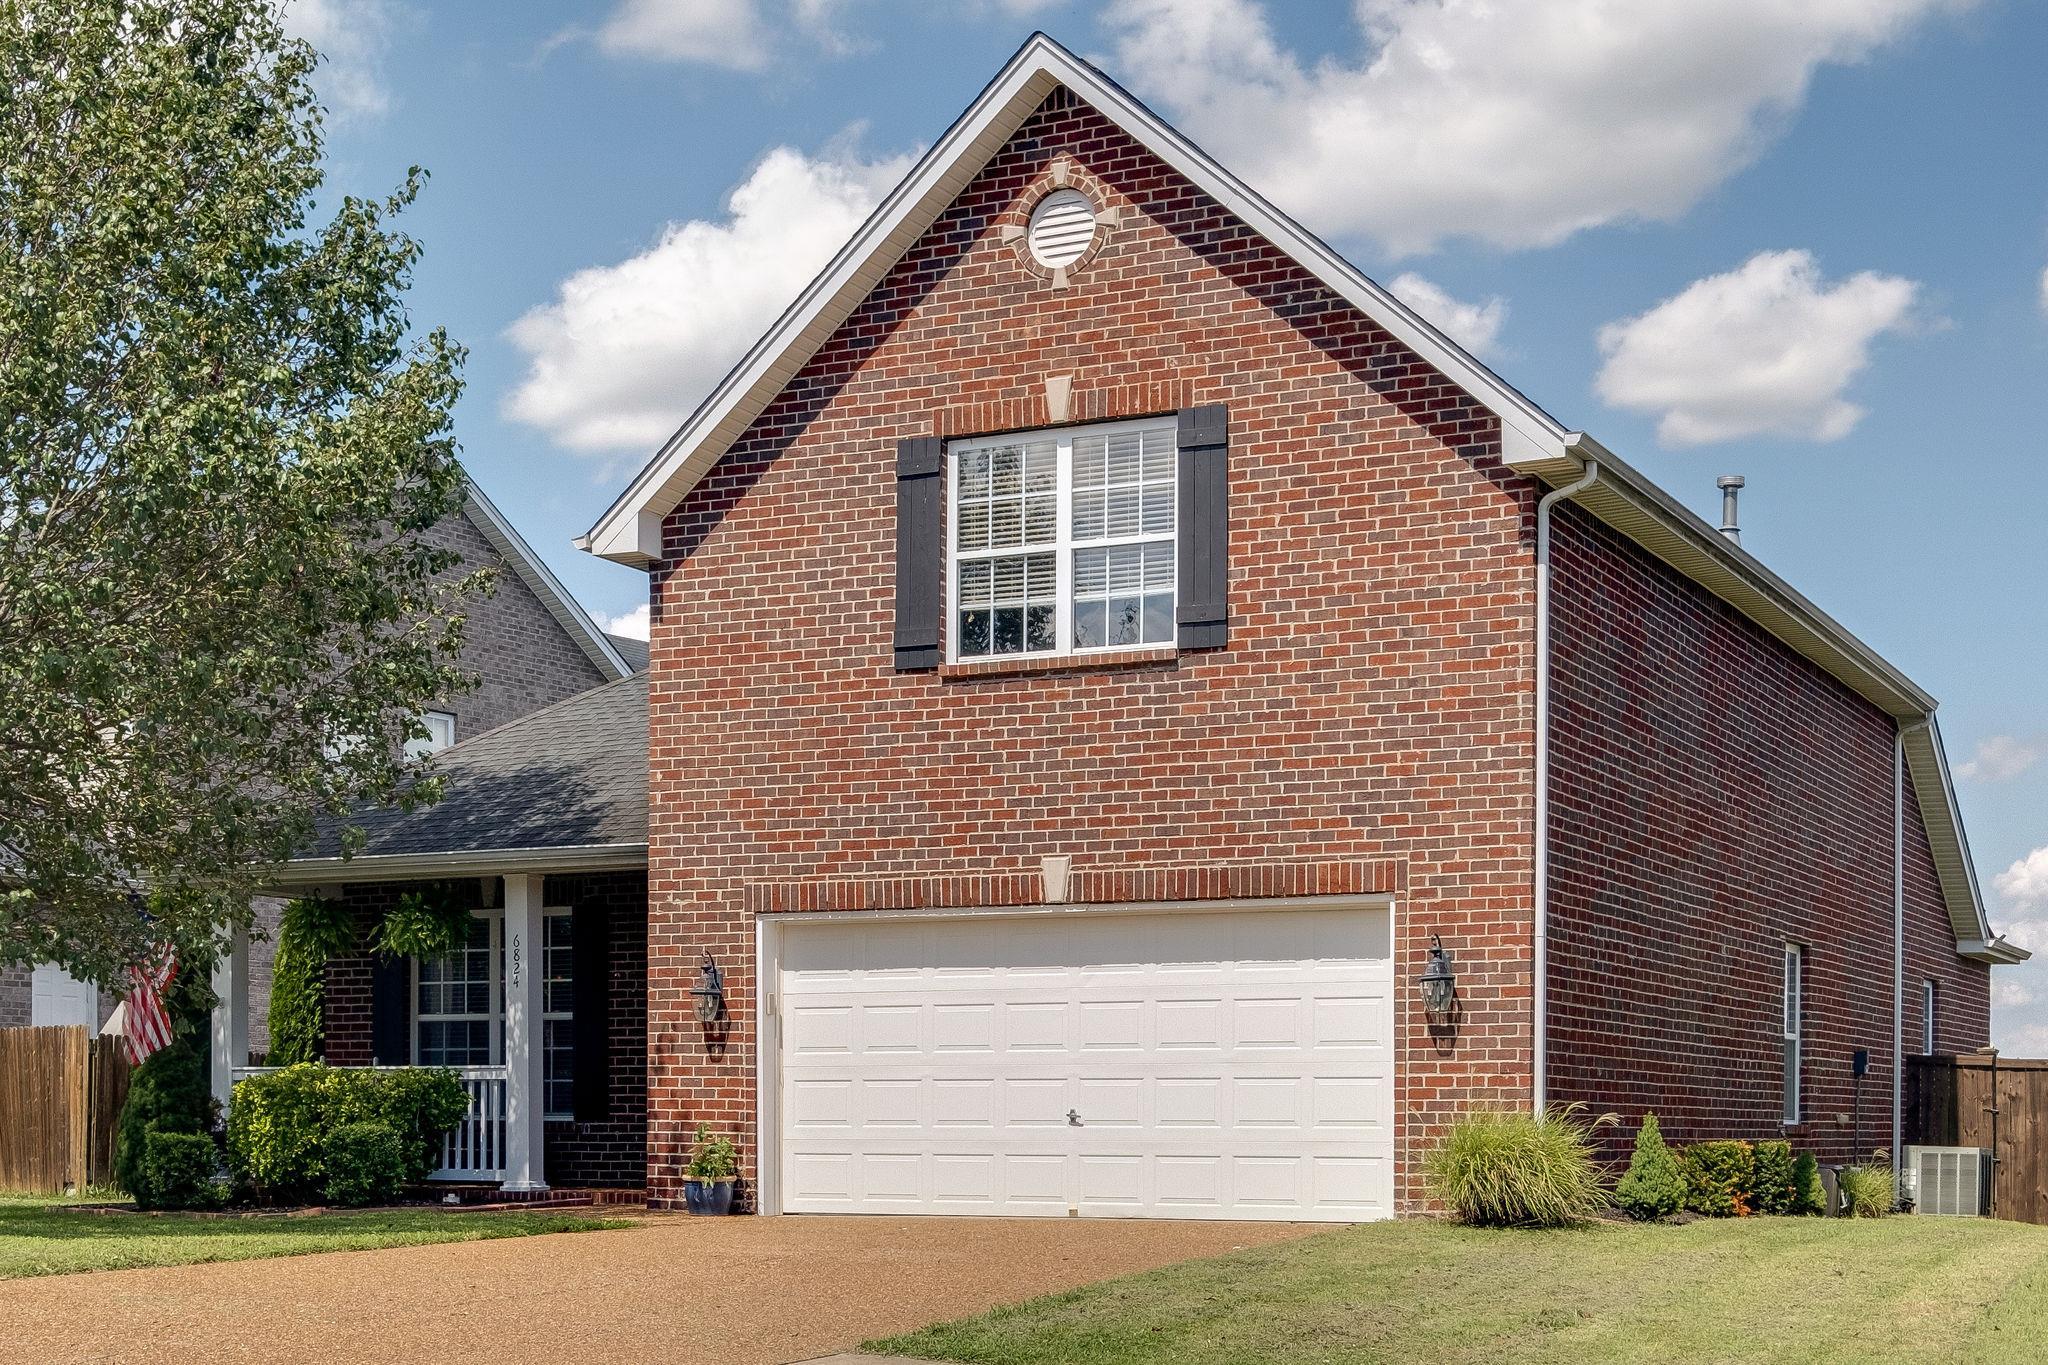 6824 Scarlet Ridge Dr, Brentwood, TN 37027 - Brentwood, TN real estate listing